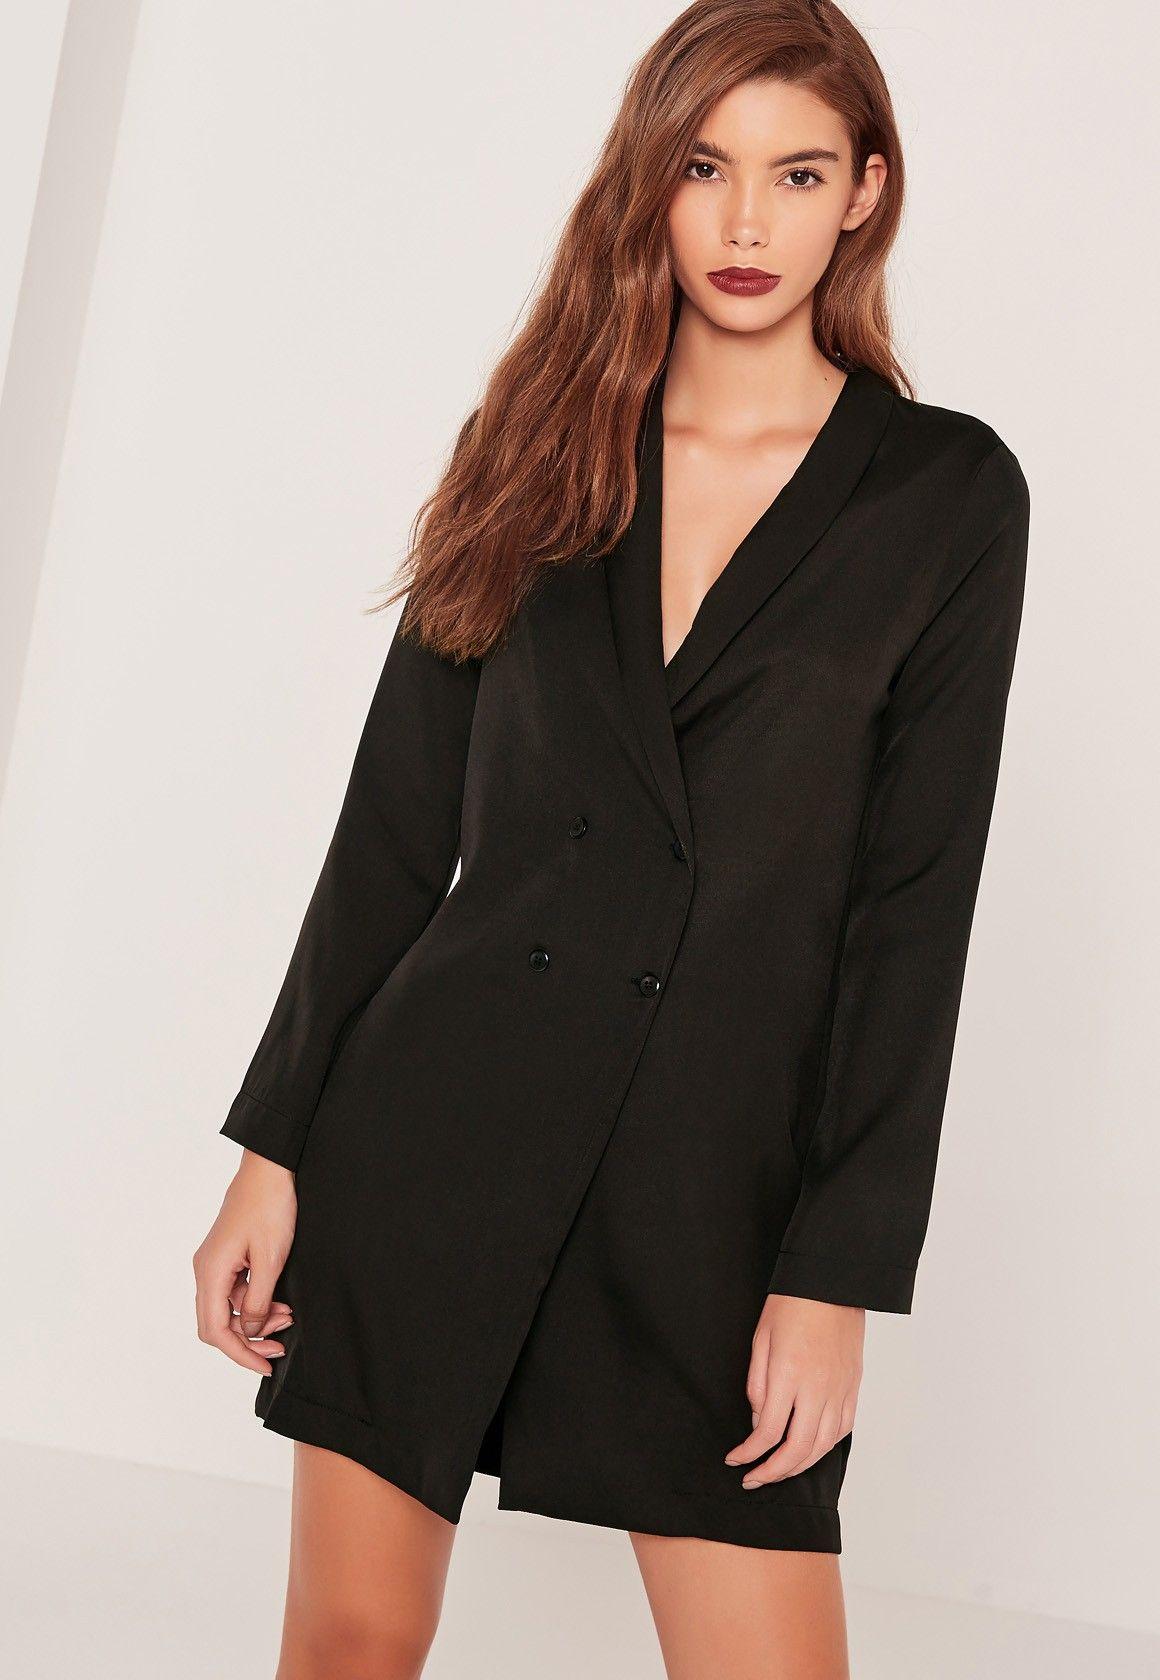 Curved Collar Blazer Dress Black - Missguided